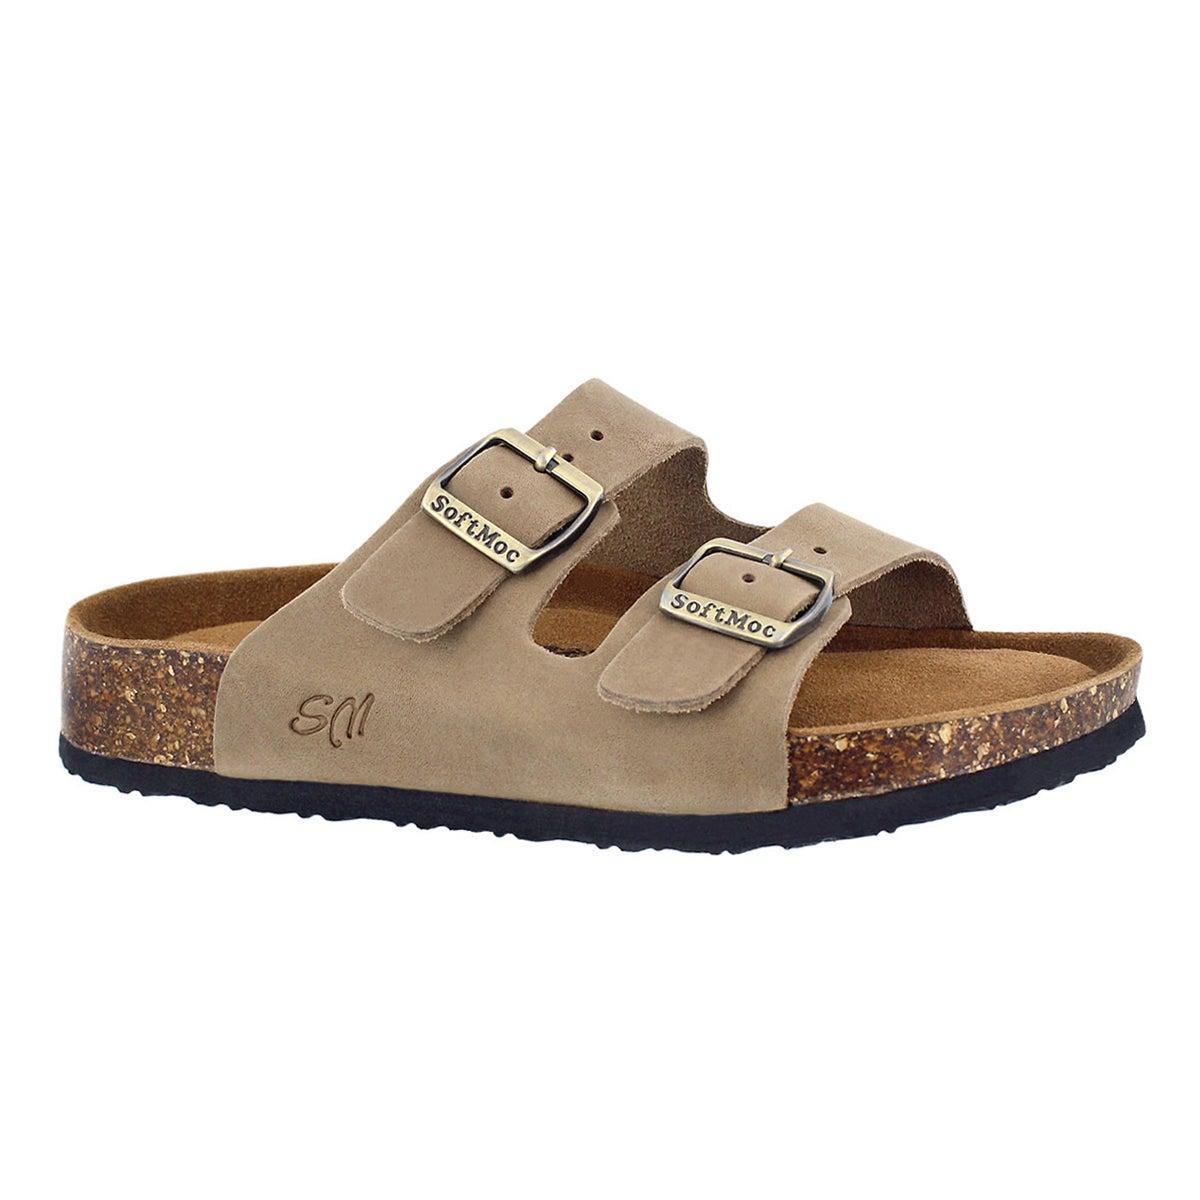 Women's ANNA 5 taupe memory foam slide sandals